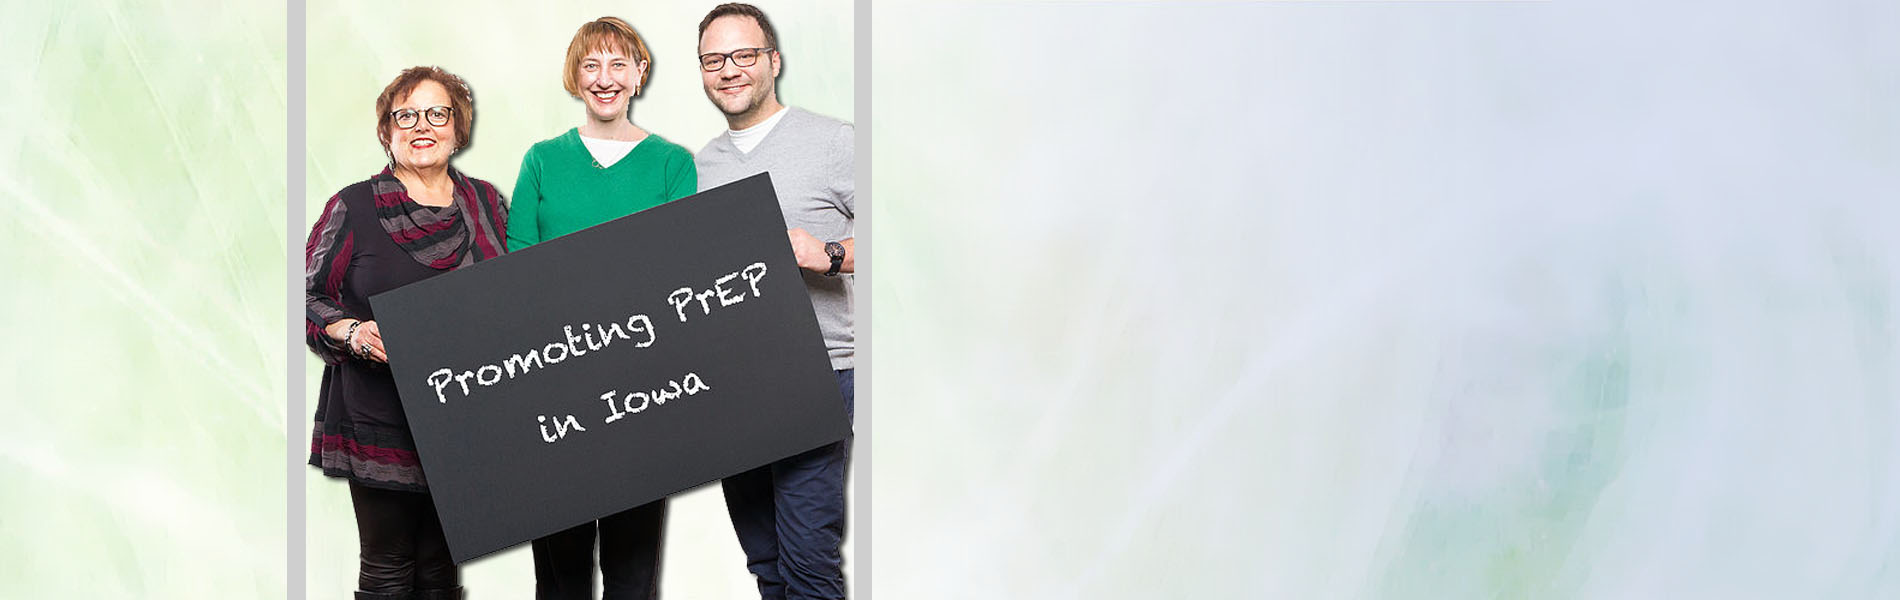 Banner: TelePrEP Receives $2M CDC Grant